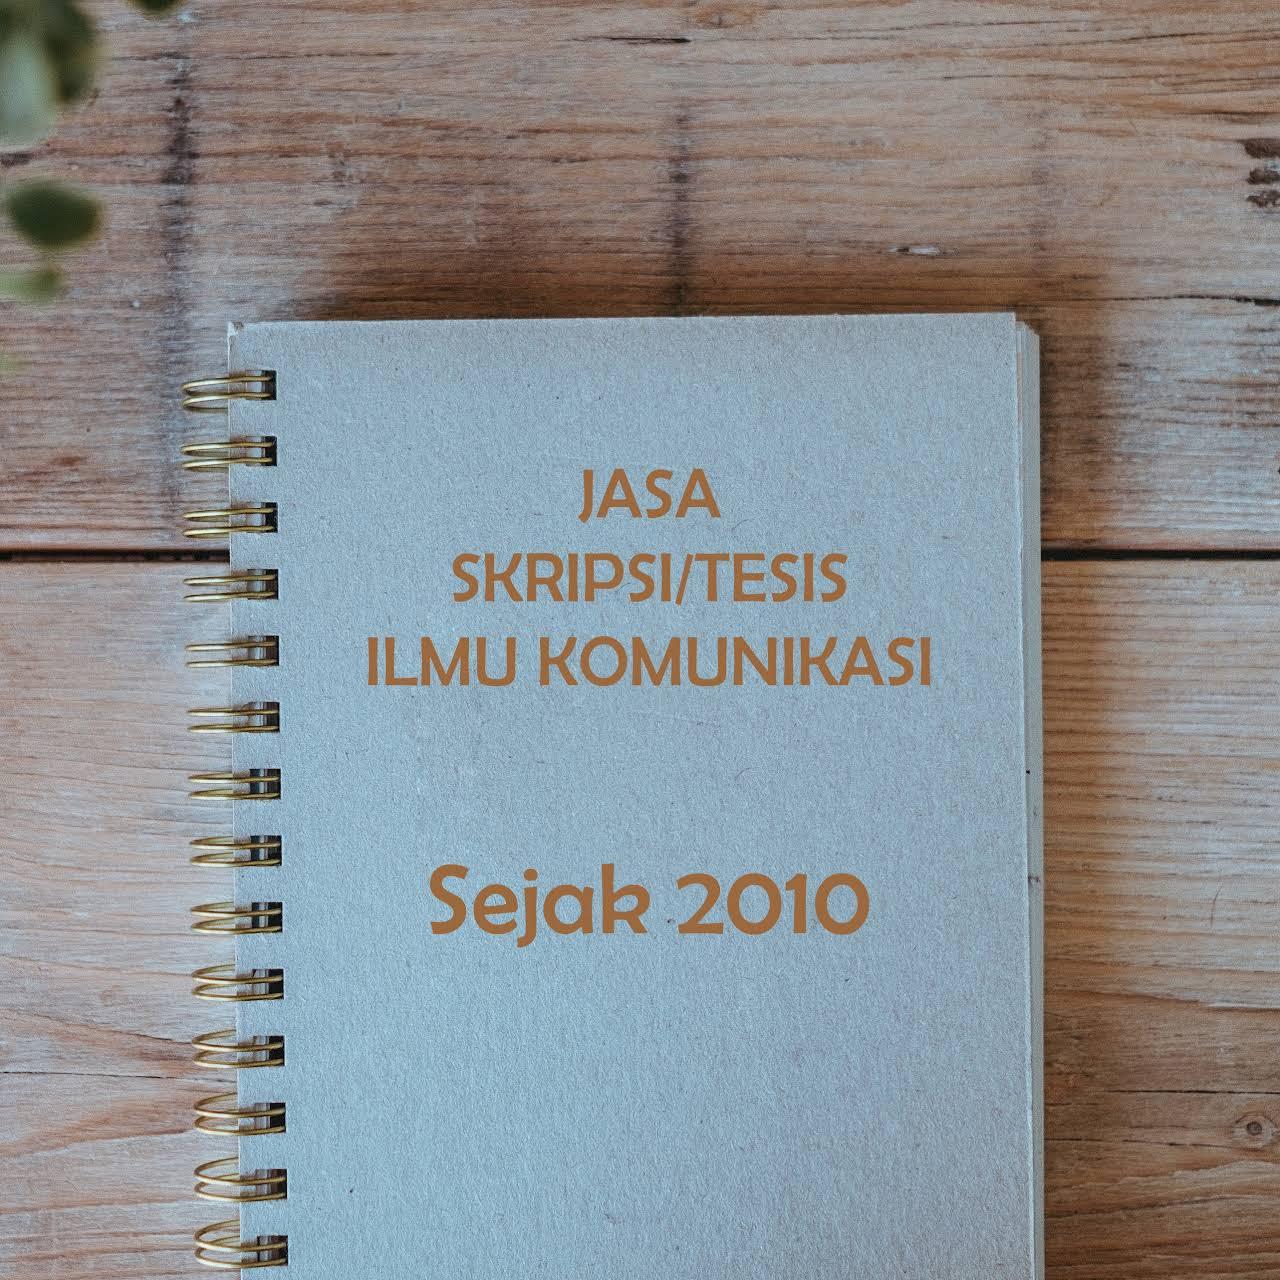 Jasa Skripsi Tesis Ilmu Komunikasi Educational Consultant